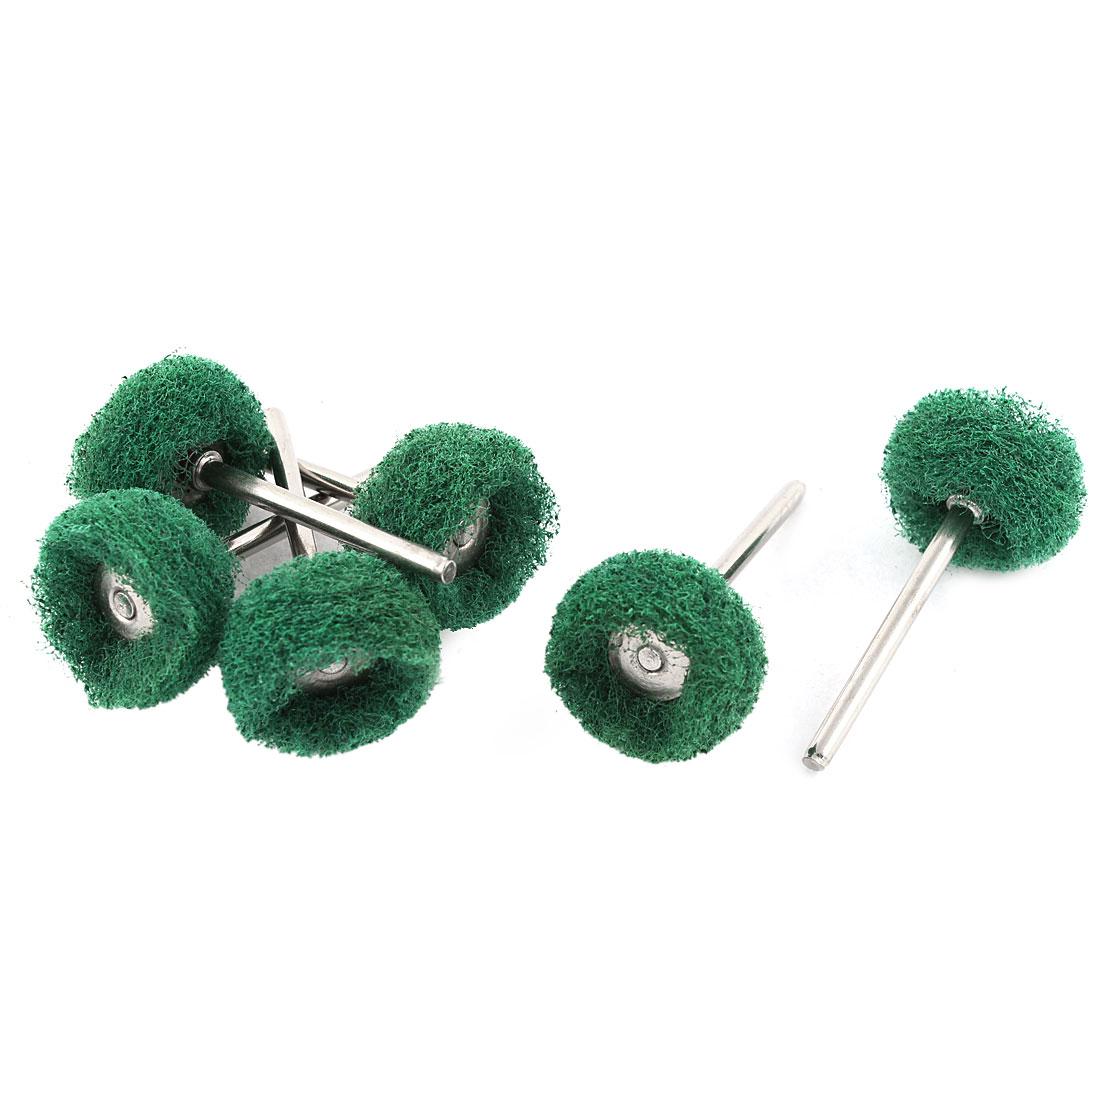 Green Fiber Satin Finish Buffing Polishing Brush Wheels Jewelry Rotary Tool 6pcs